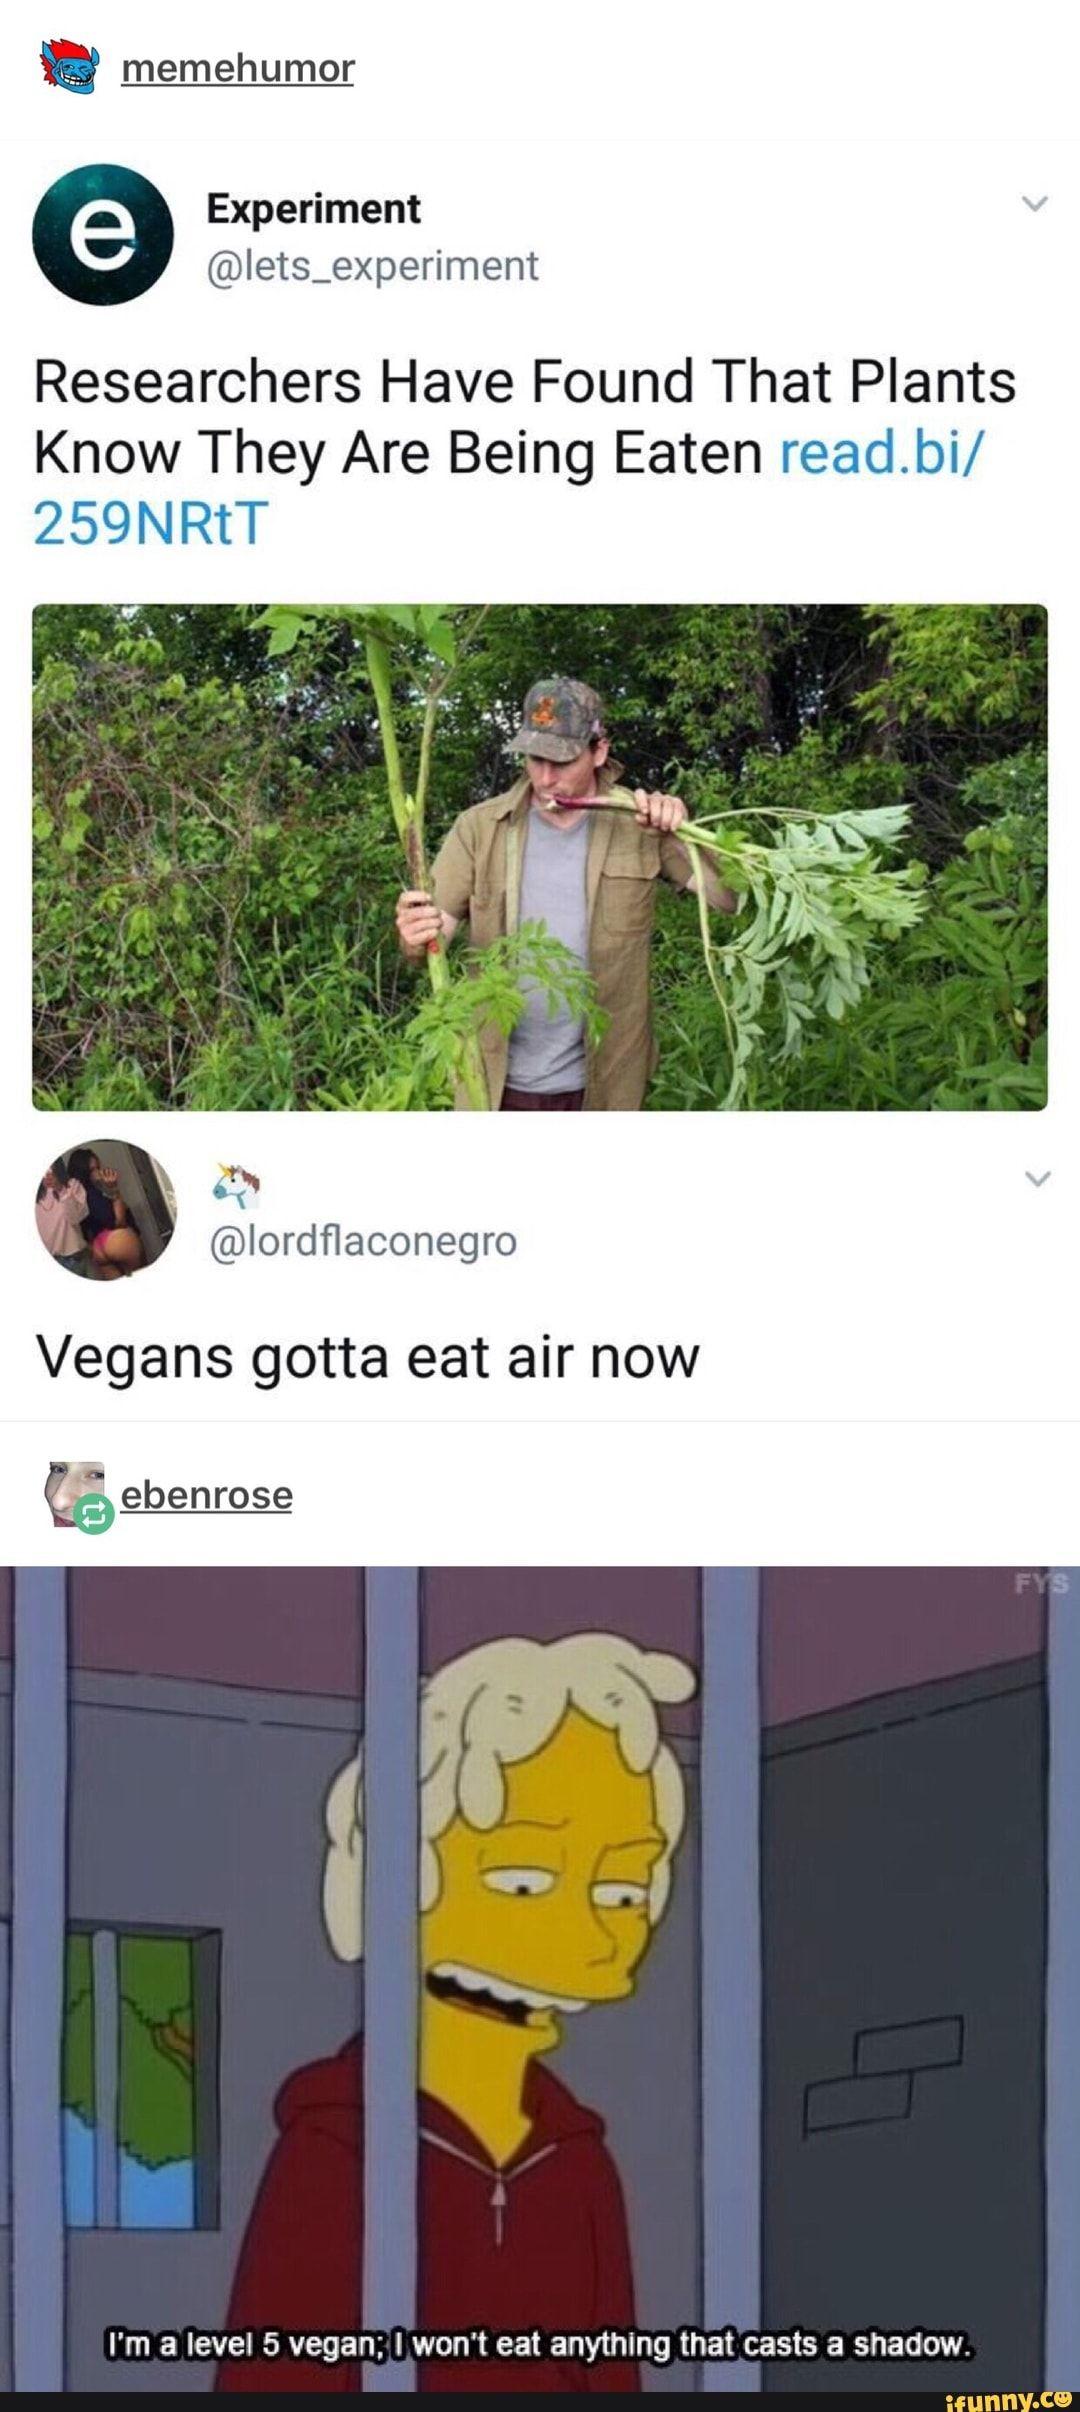 goeatabagofdicksgreg, fuckyougreg, vegan, plant, simpsons - iFunny :) Super  Funny,. Read it